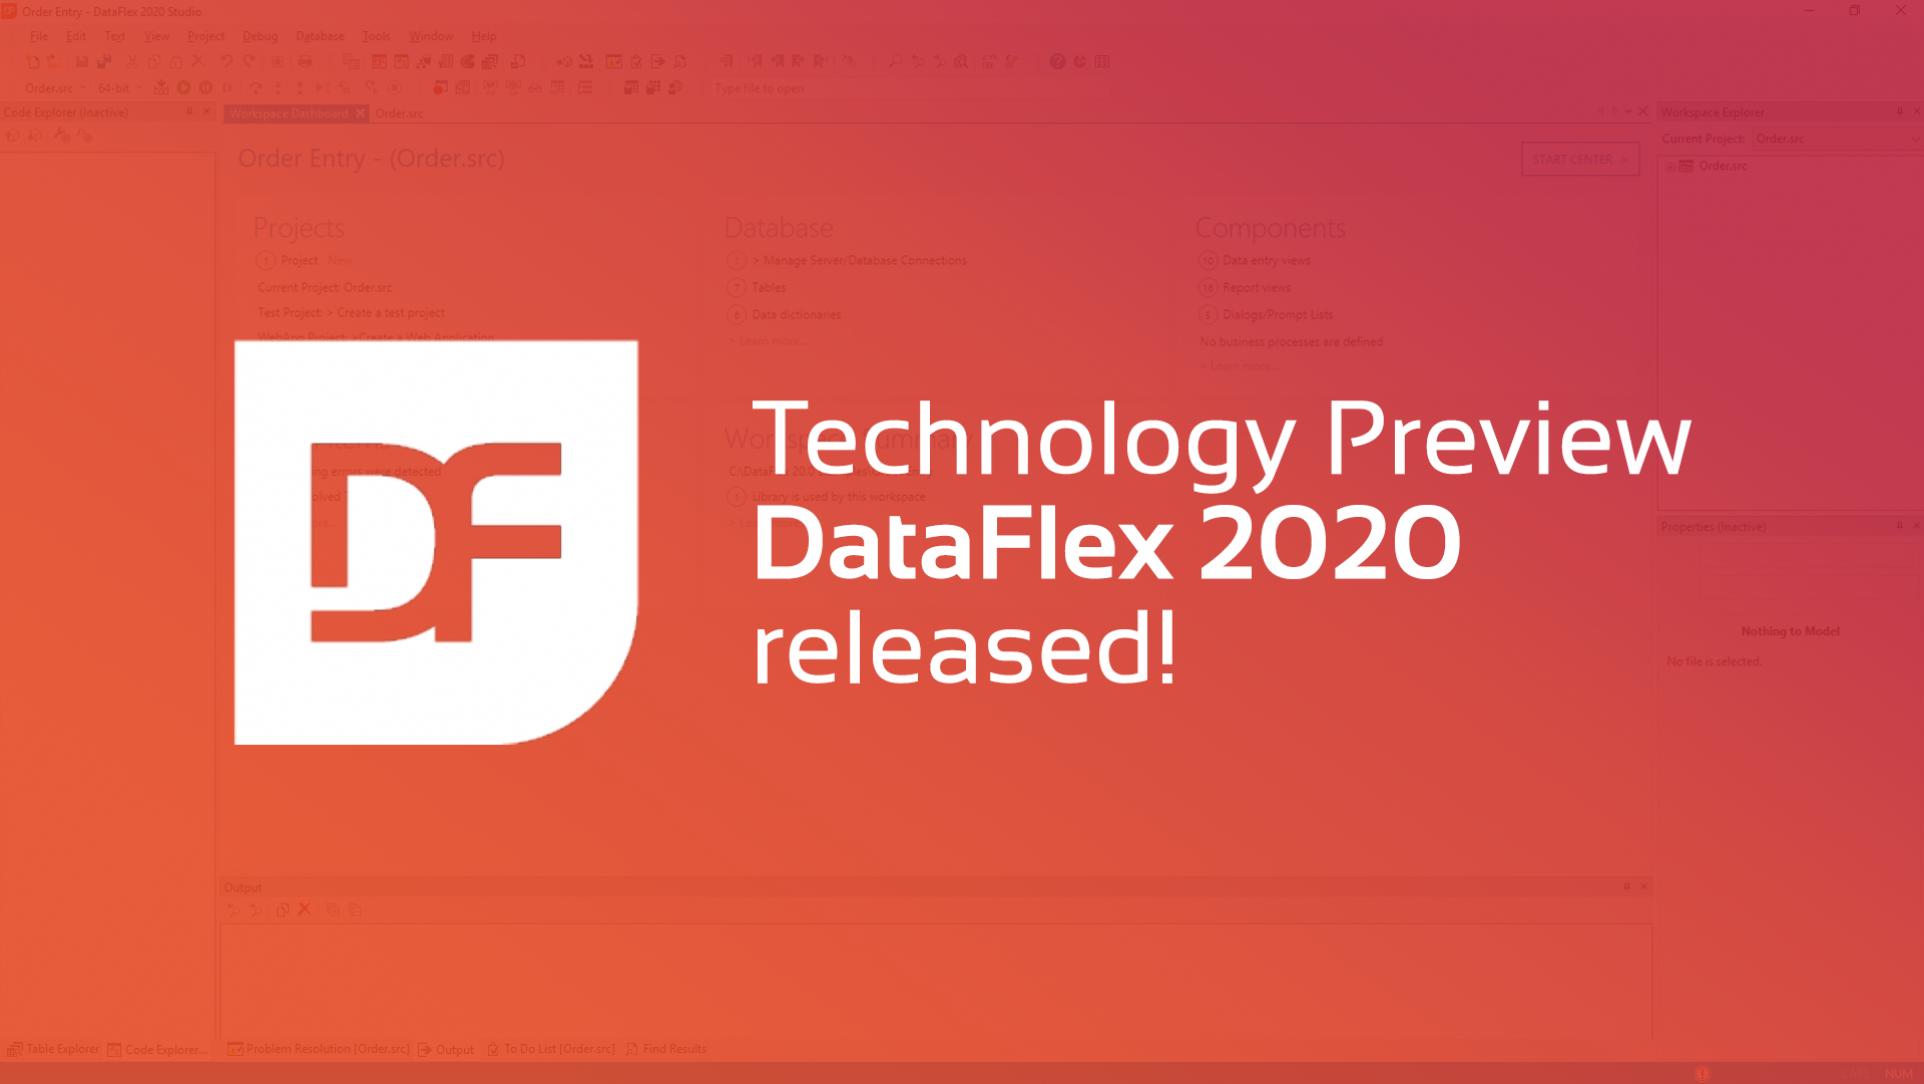 2019-11-13 TP DataFlex 2020 OG image